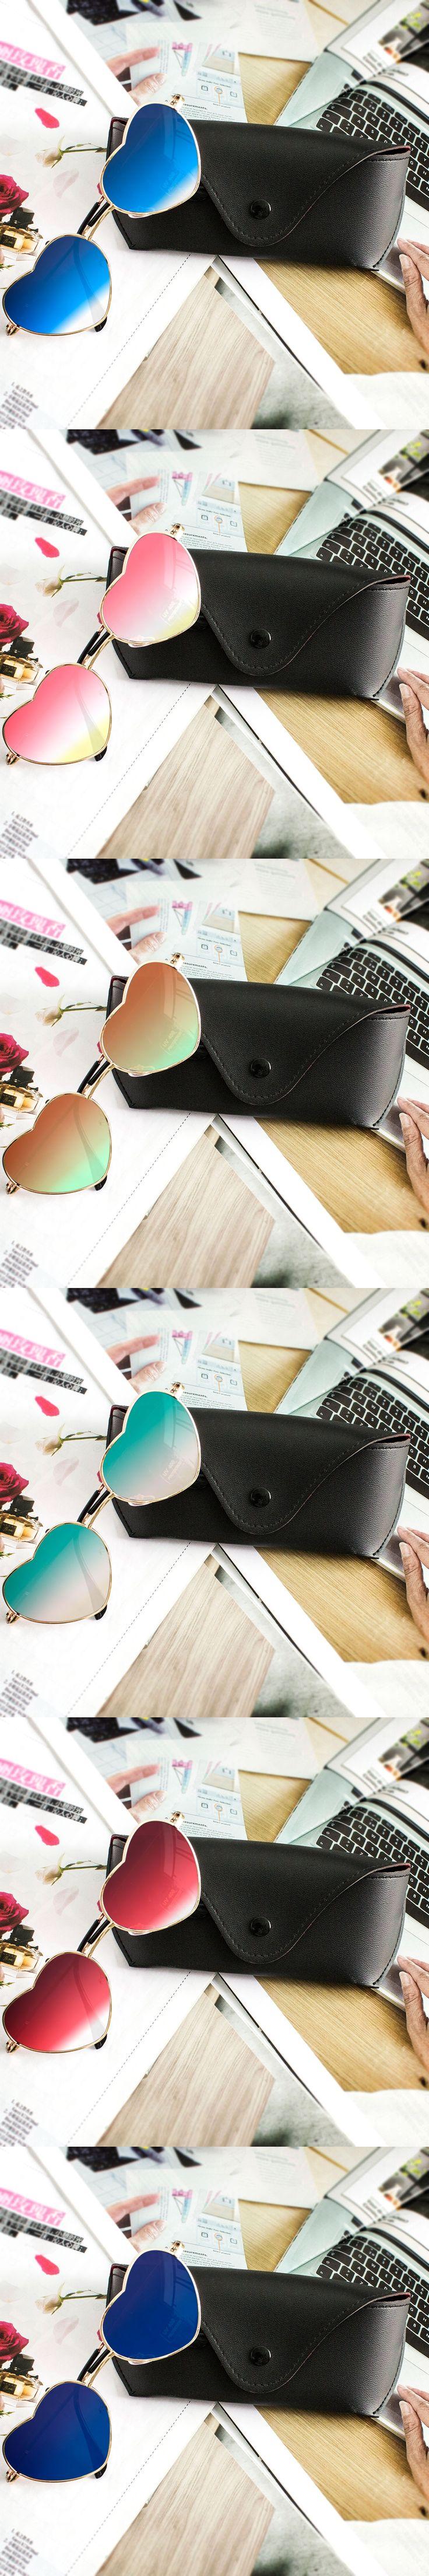 2016 New Trendy Heart Shaped Sunglasses Plus Glasses Case WOMEN metal Reflective lens sun glassese MEN Mirror oculos de sol